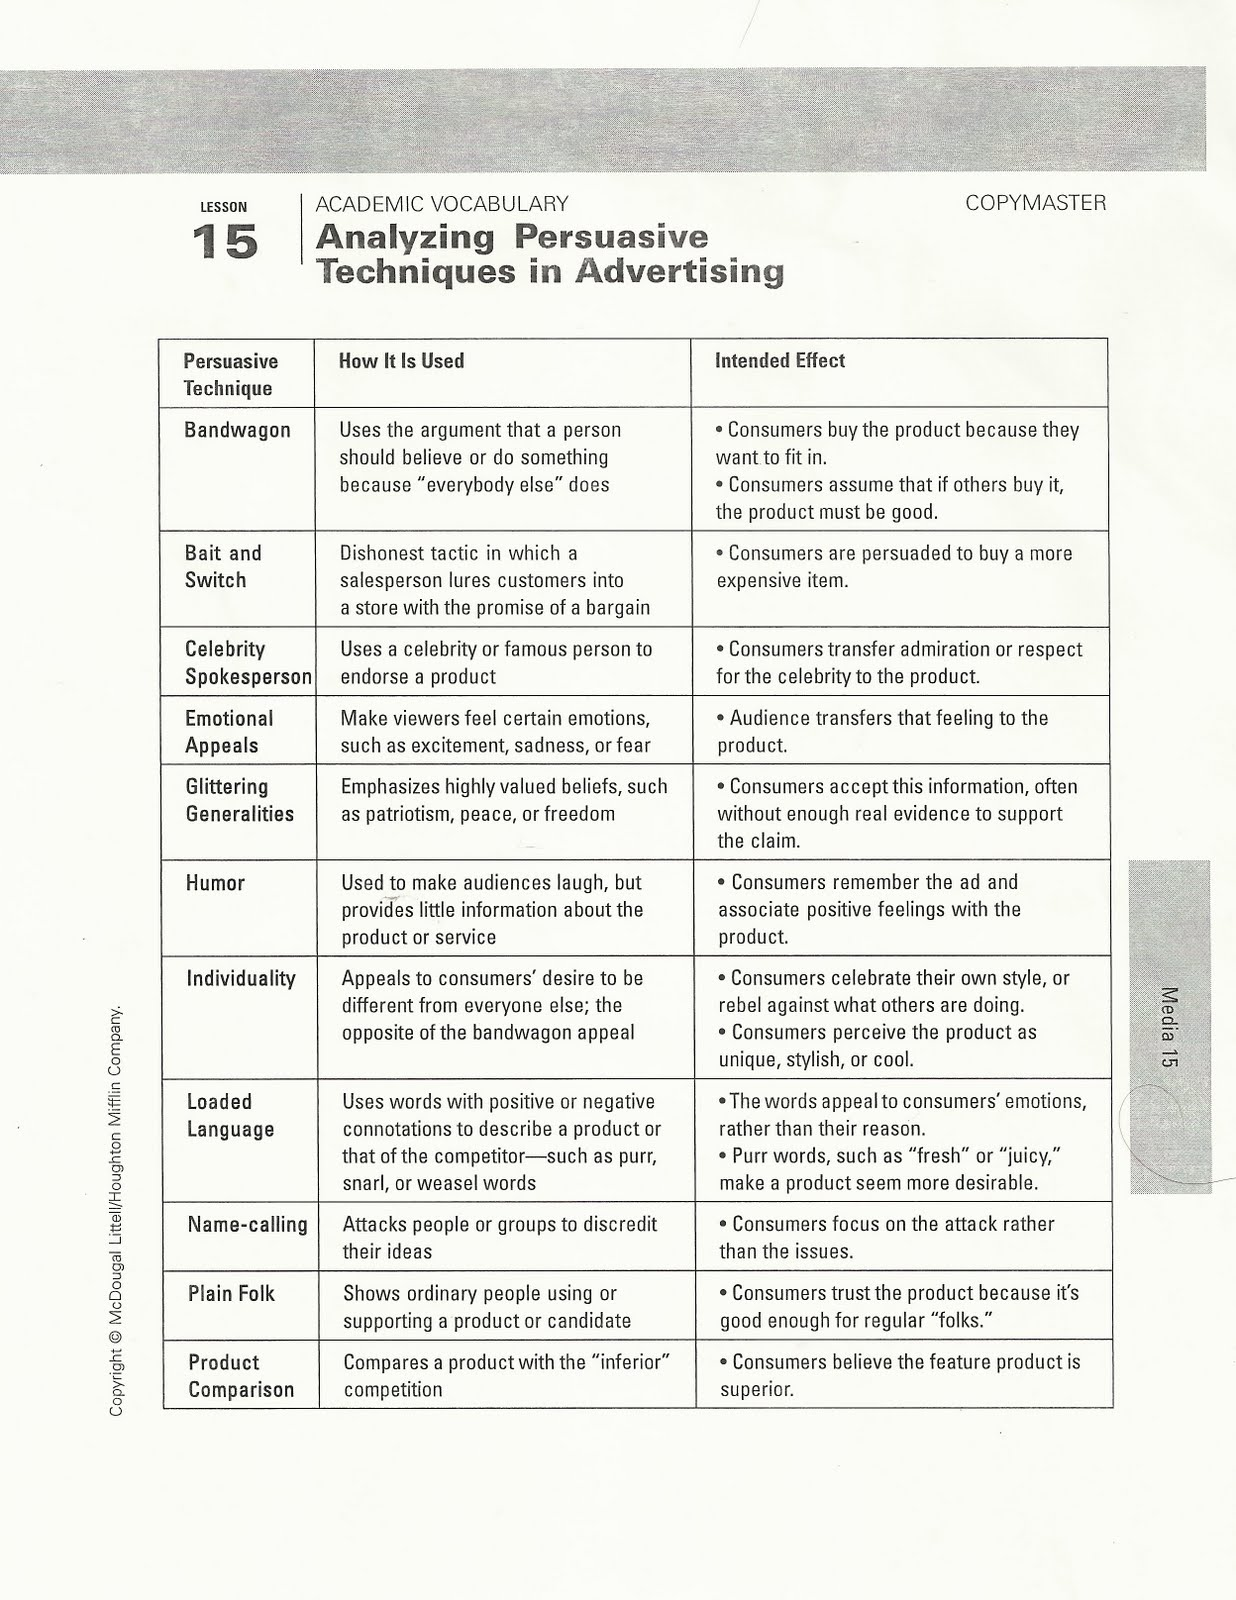 Printables Persuasive Techniques Worksheets persuasive techniques worksheets versaldobip printables safarmediapps